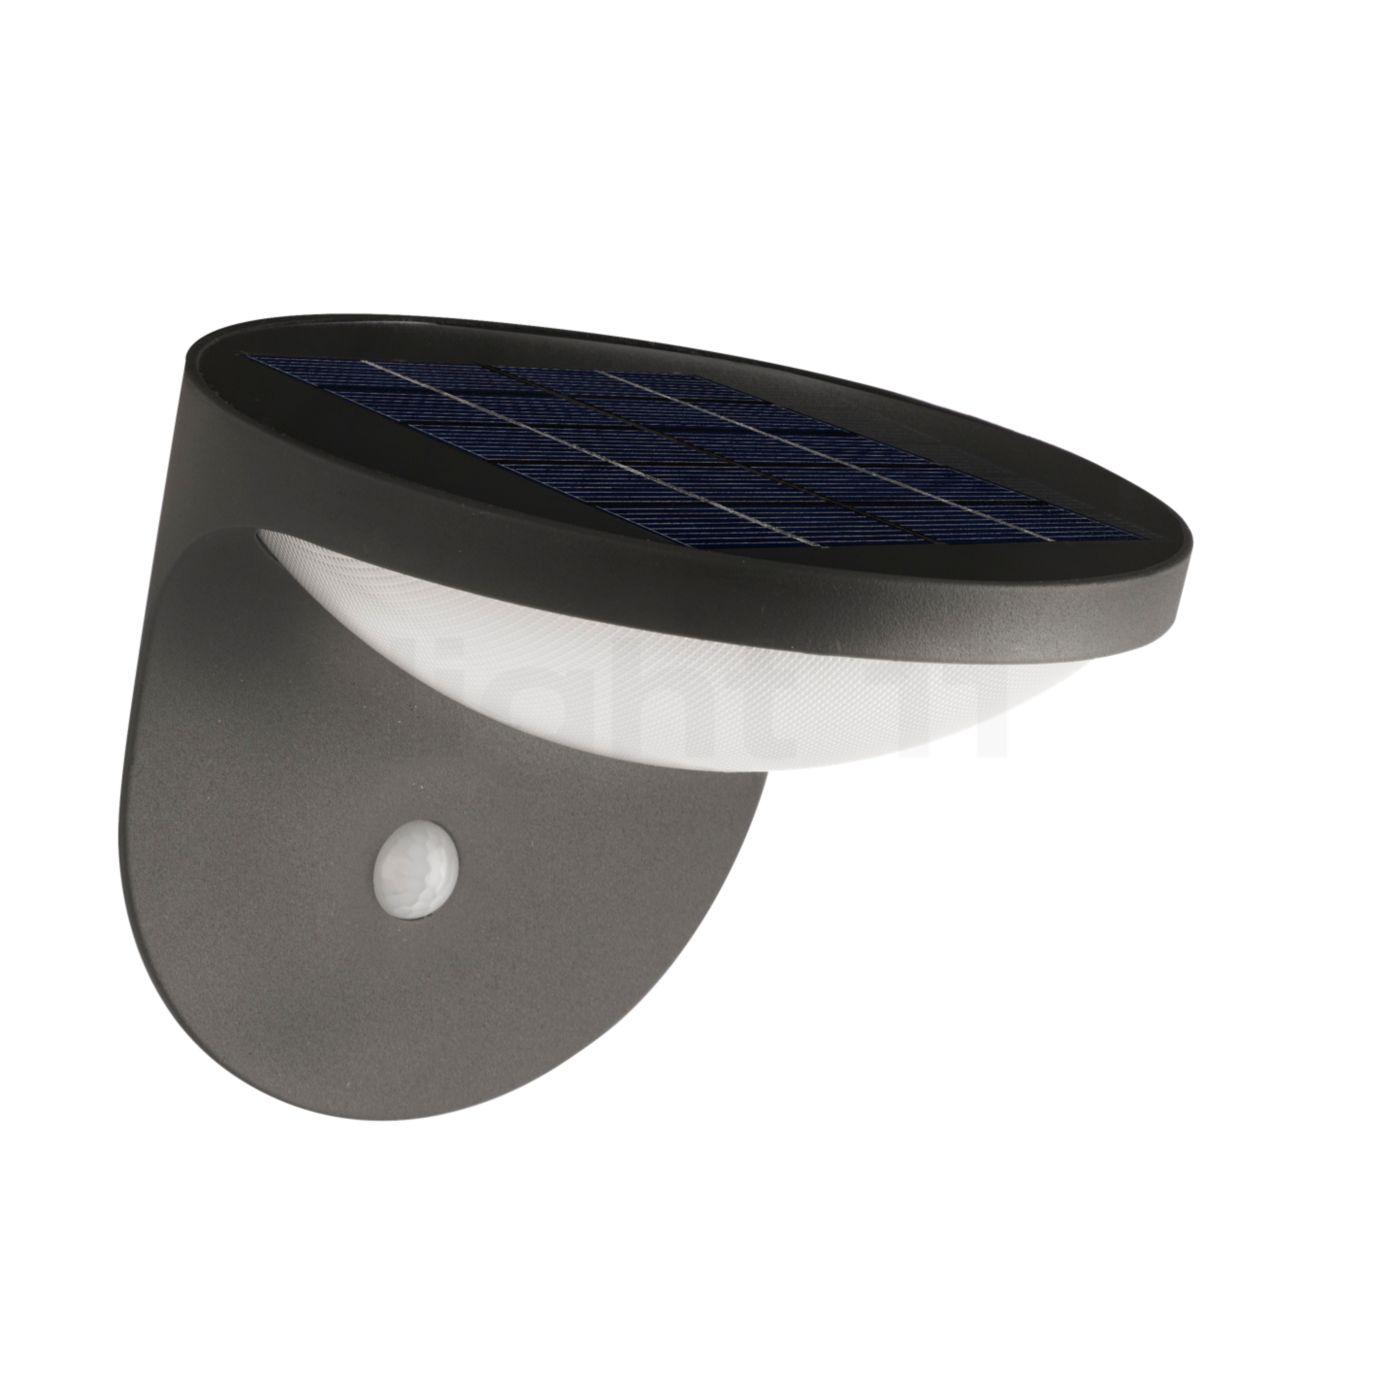 philips capplique mygarden dusk sensor catgorie eclairage extrieur. Black Bedroom Furniture Sets. Home Design Ideas